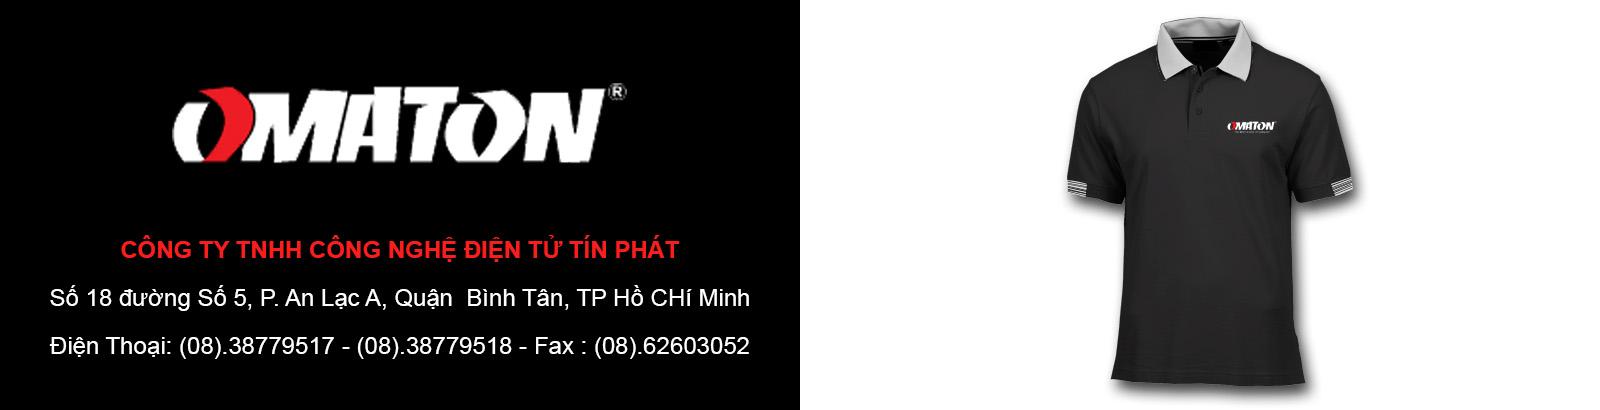 Tín Phát